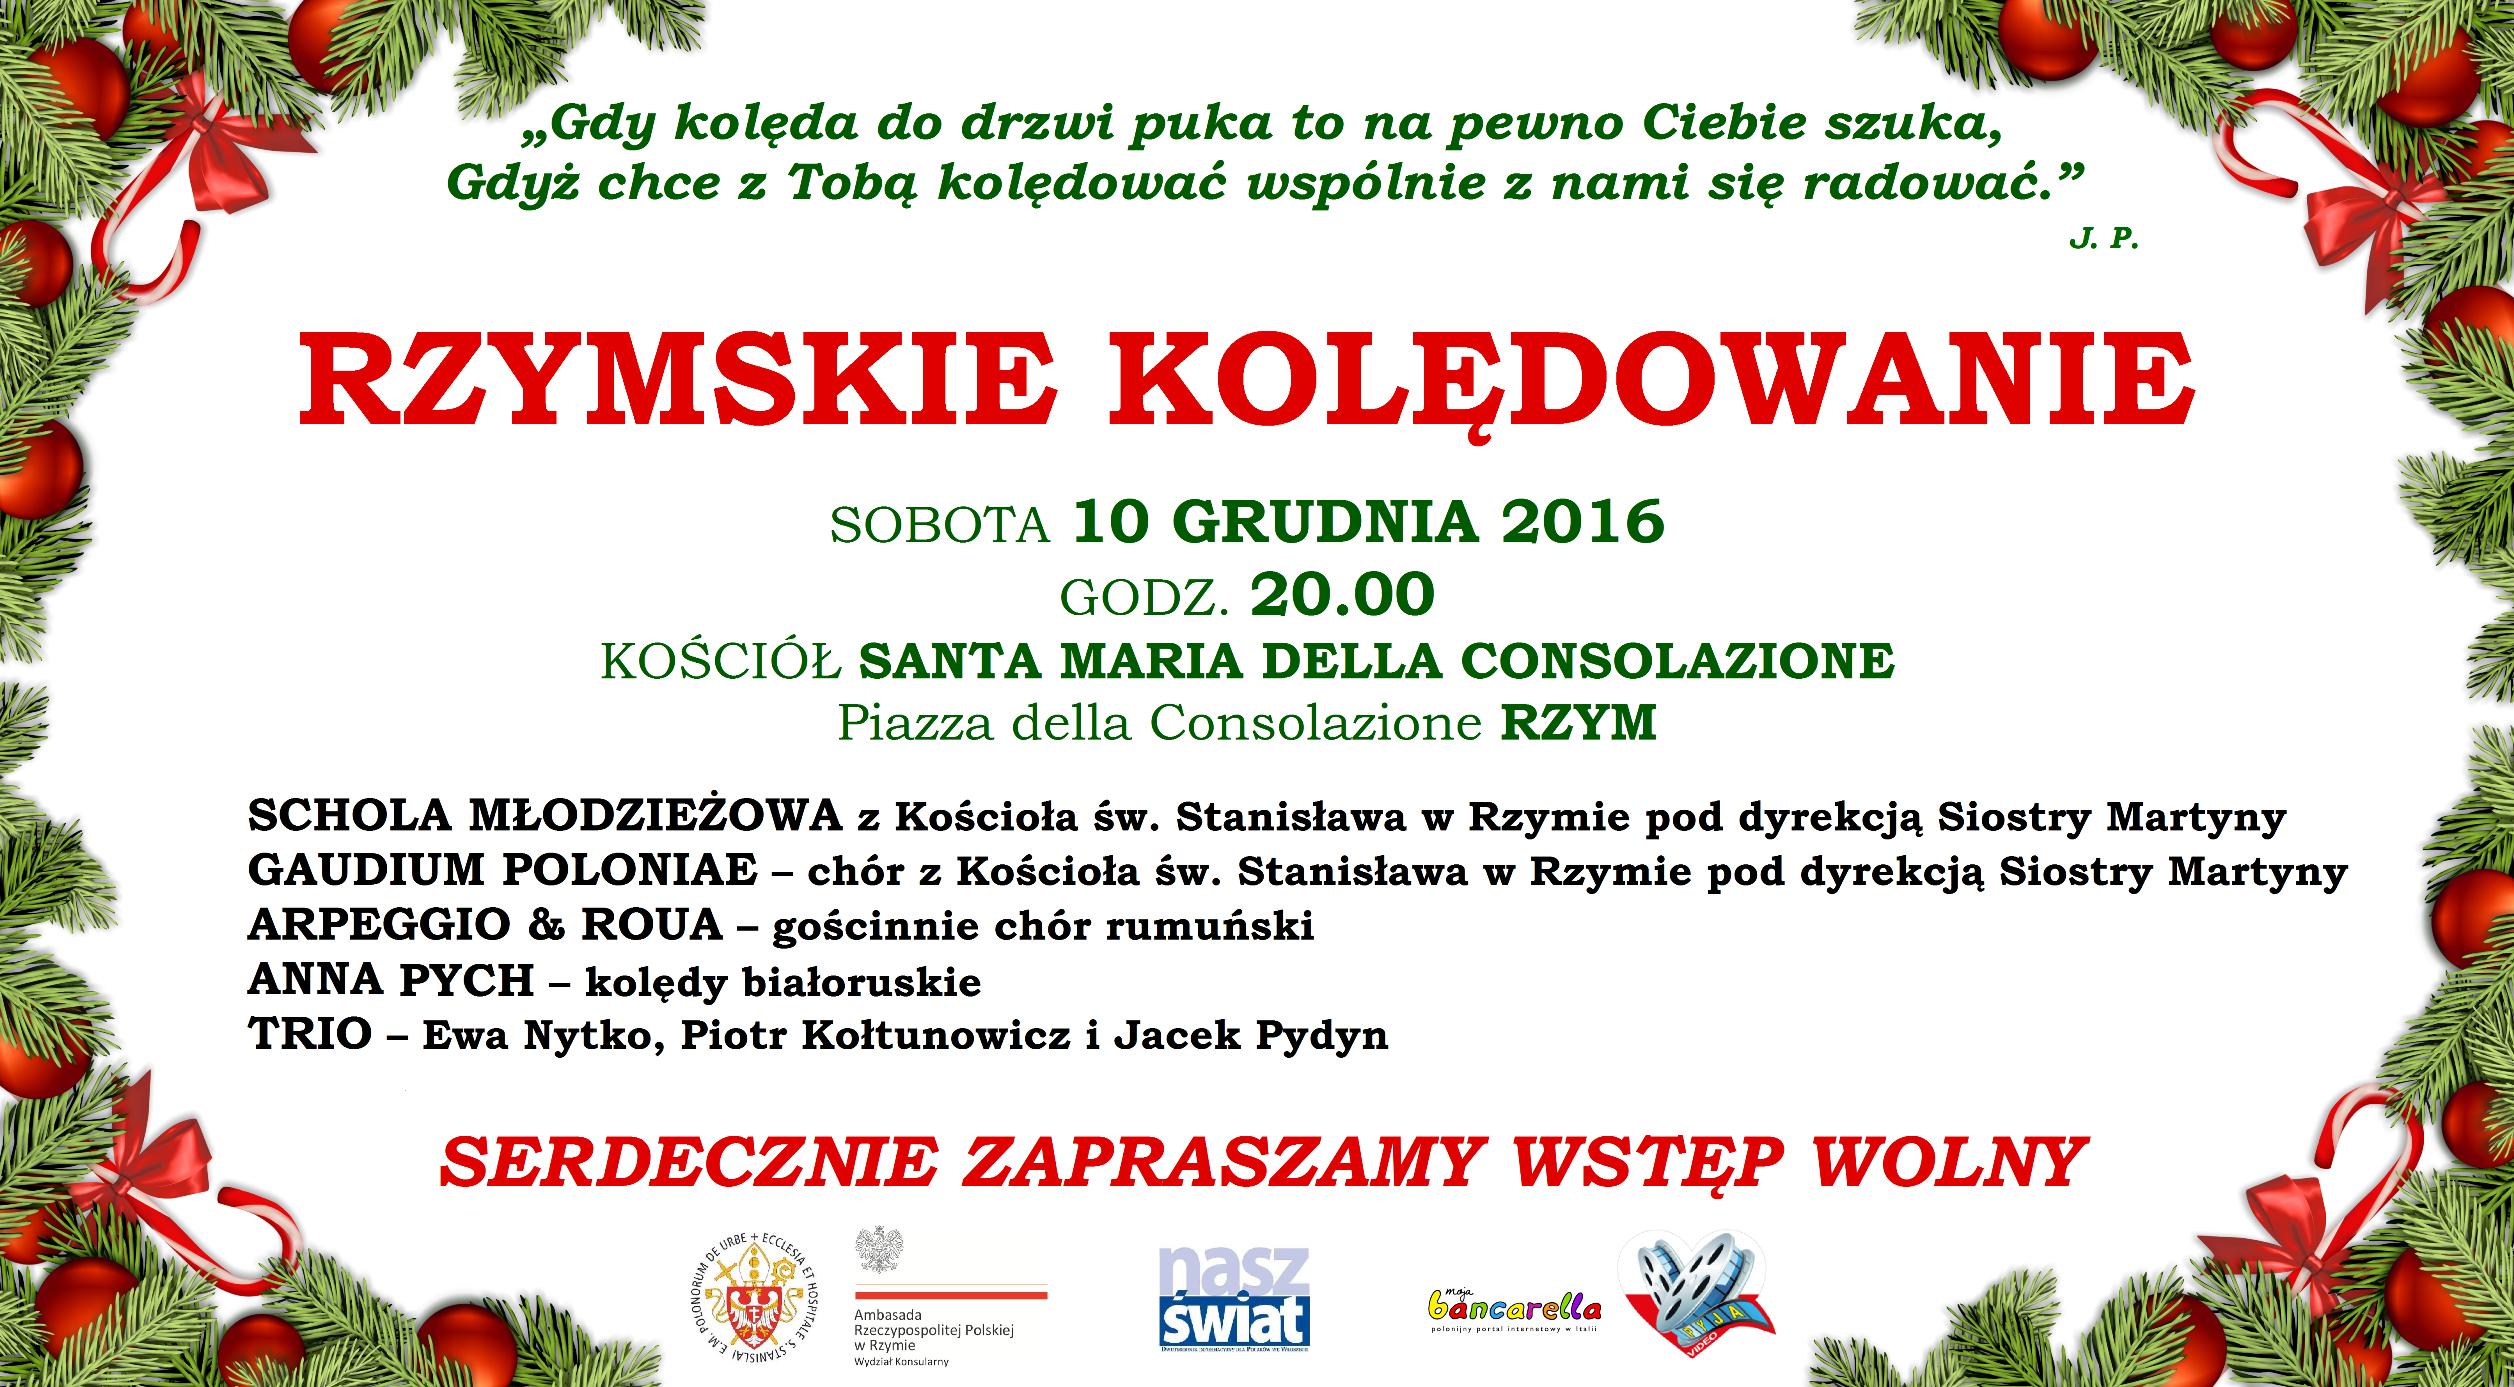 plakat_koncert_rzym_polacy_we_wloszech